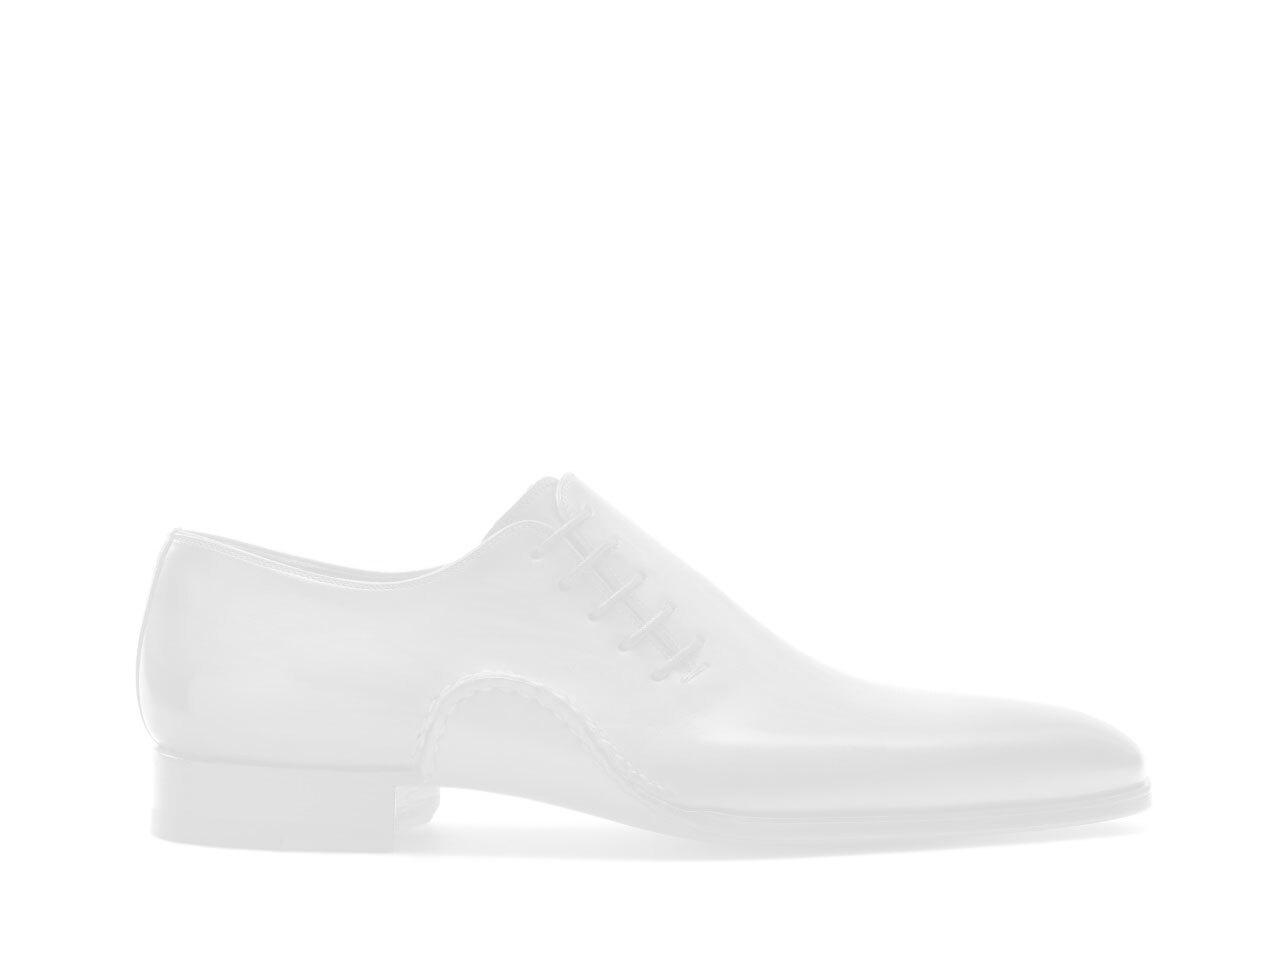 Pair of the Magnanni Marco Wide Cuero Men's Single Monk Strap Shoes